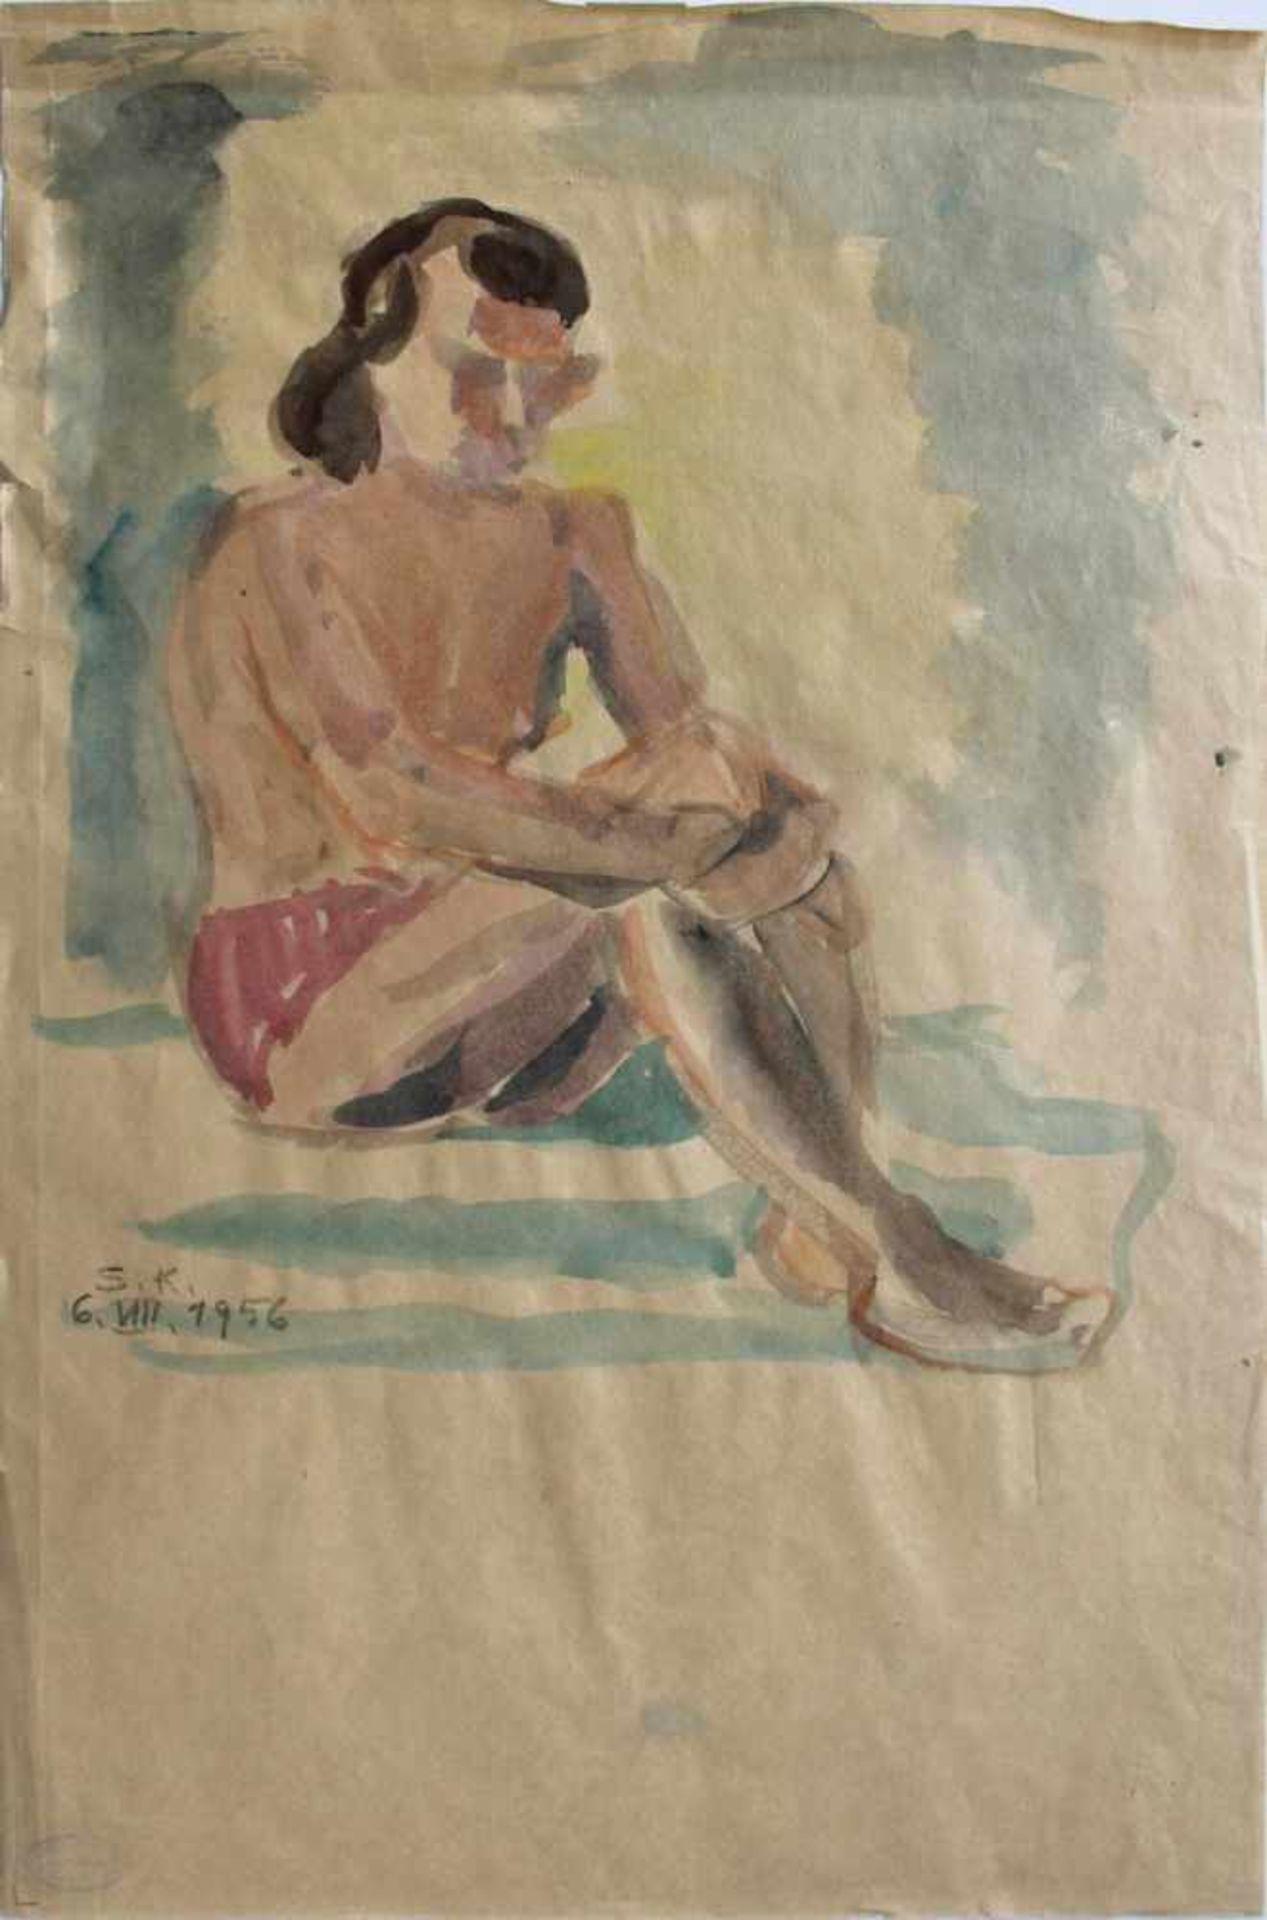 Silvia Koller 1942-2010 Aktstudie 3 1956 Aquarell monogrammiert und datiert (S.K. 6 VIII 1956) 56